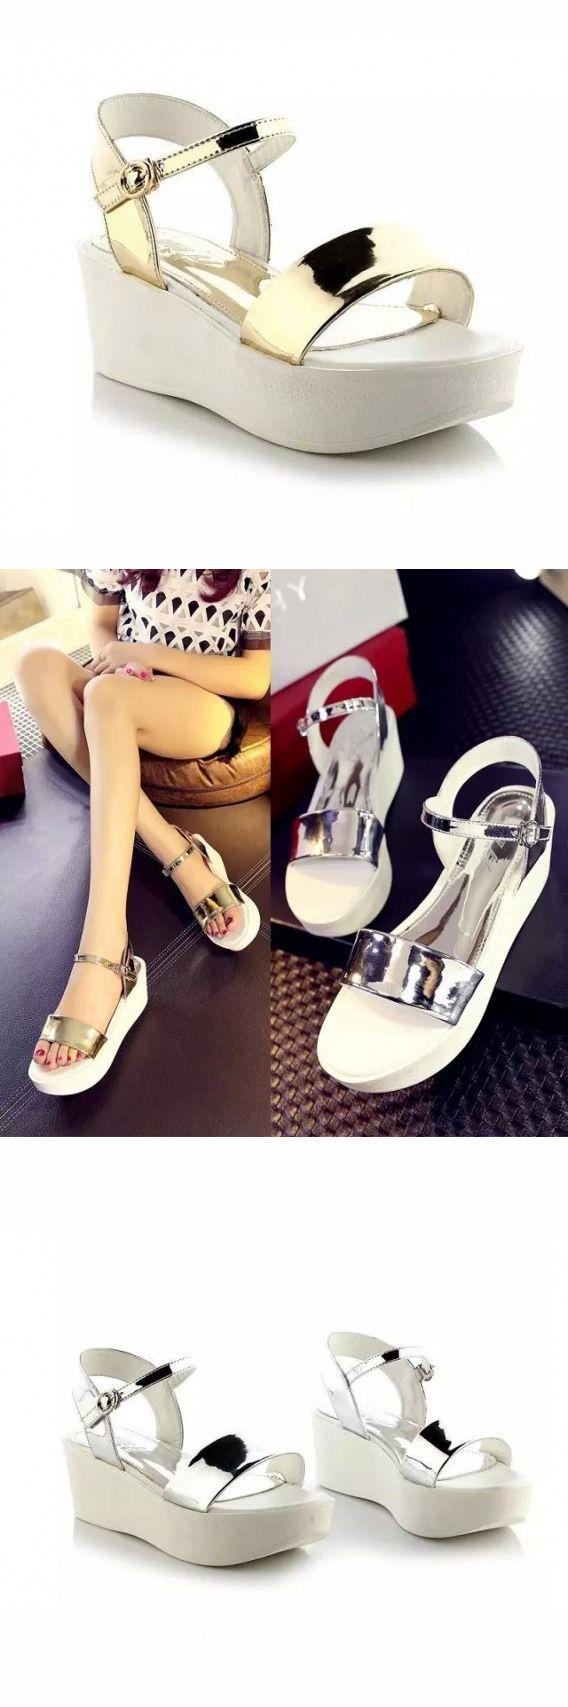 Whitened Dressy New Sandals Rubber Sole Neon Office Sandals Pump Pedicure Little…